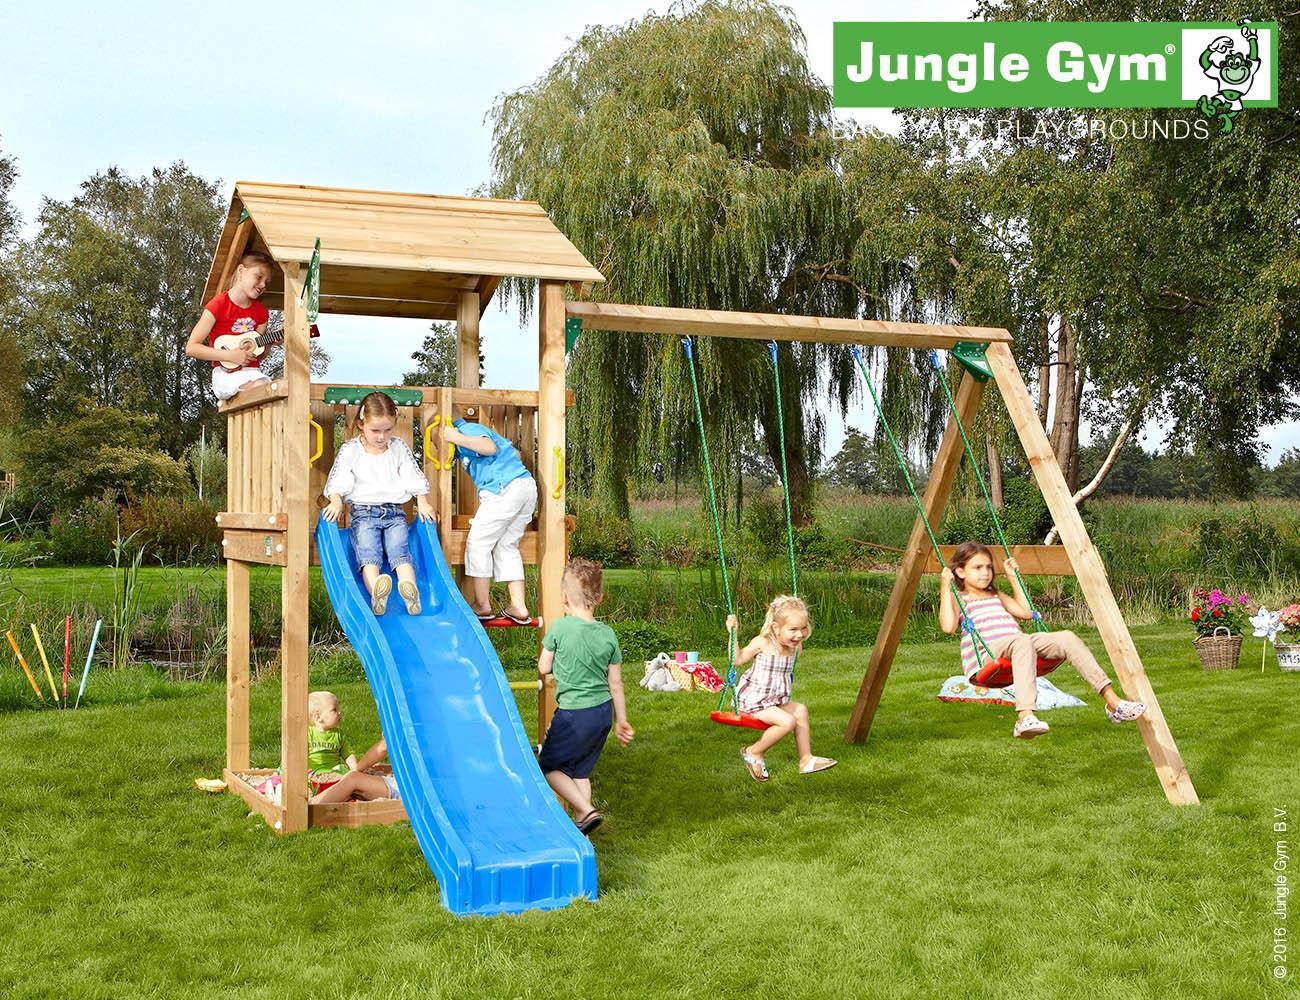 Jungle Gym Casa –leikkitorni ja keinut